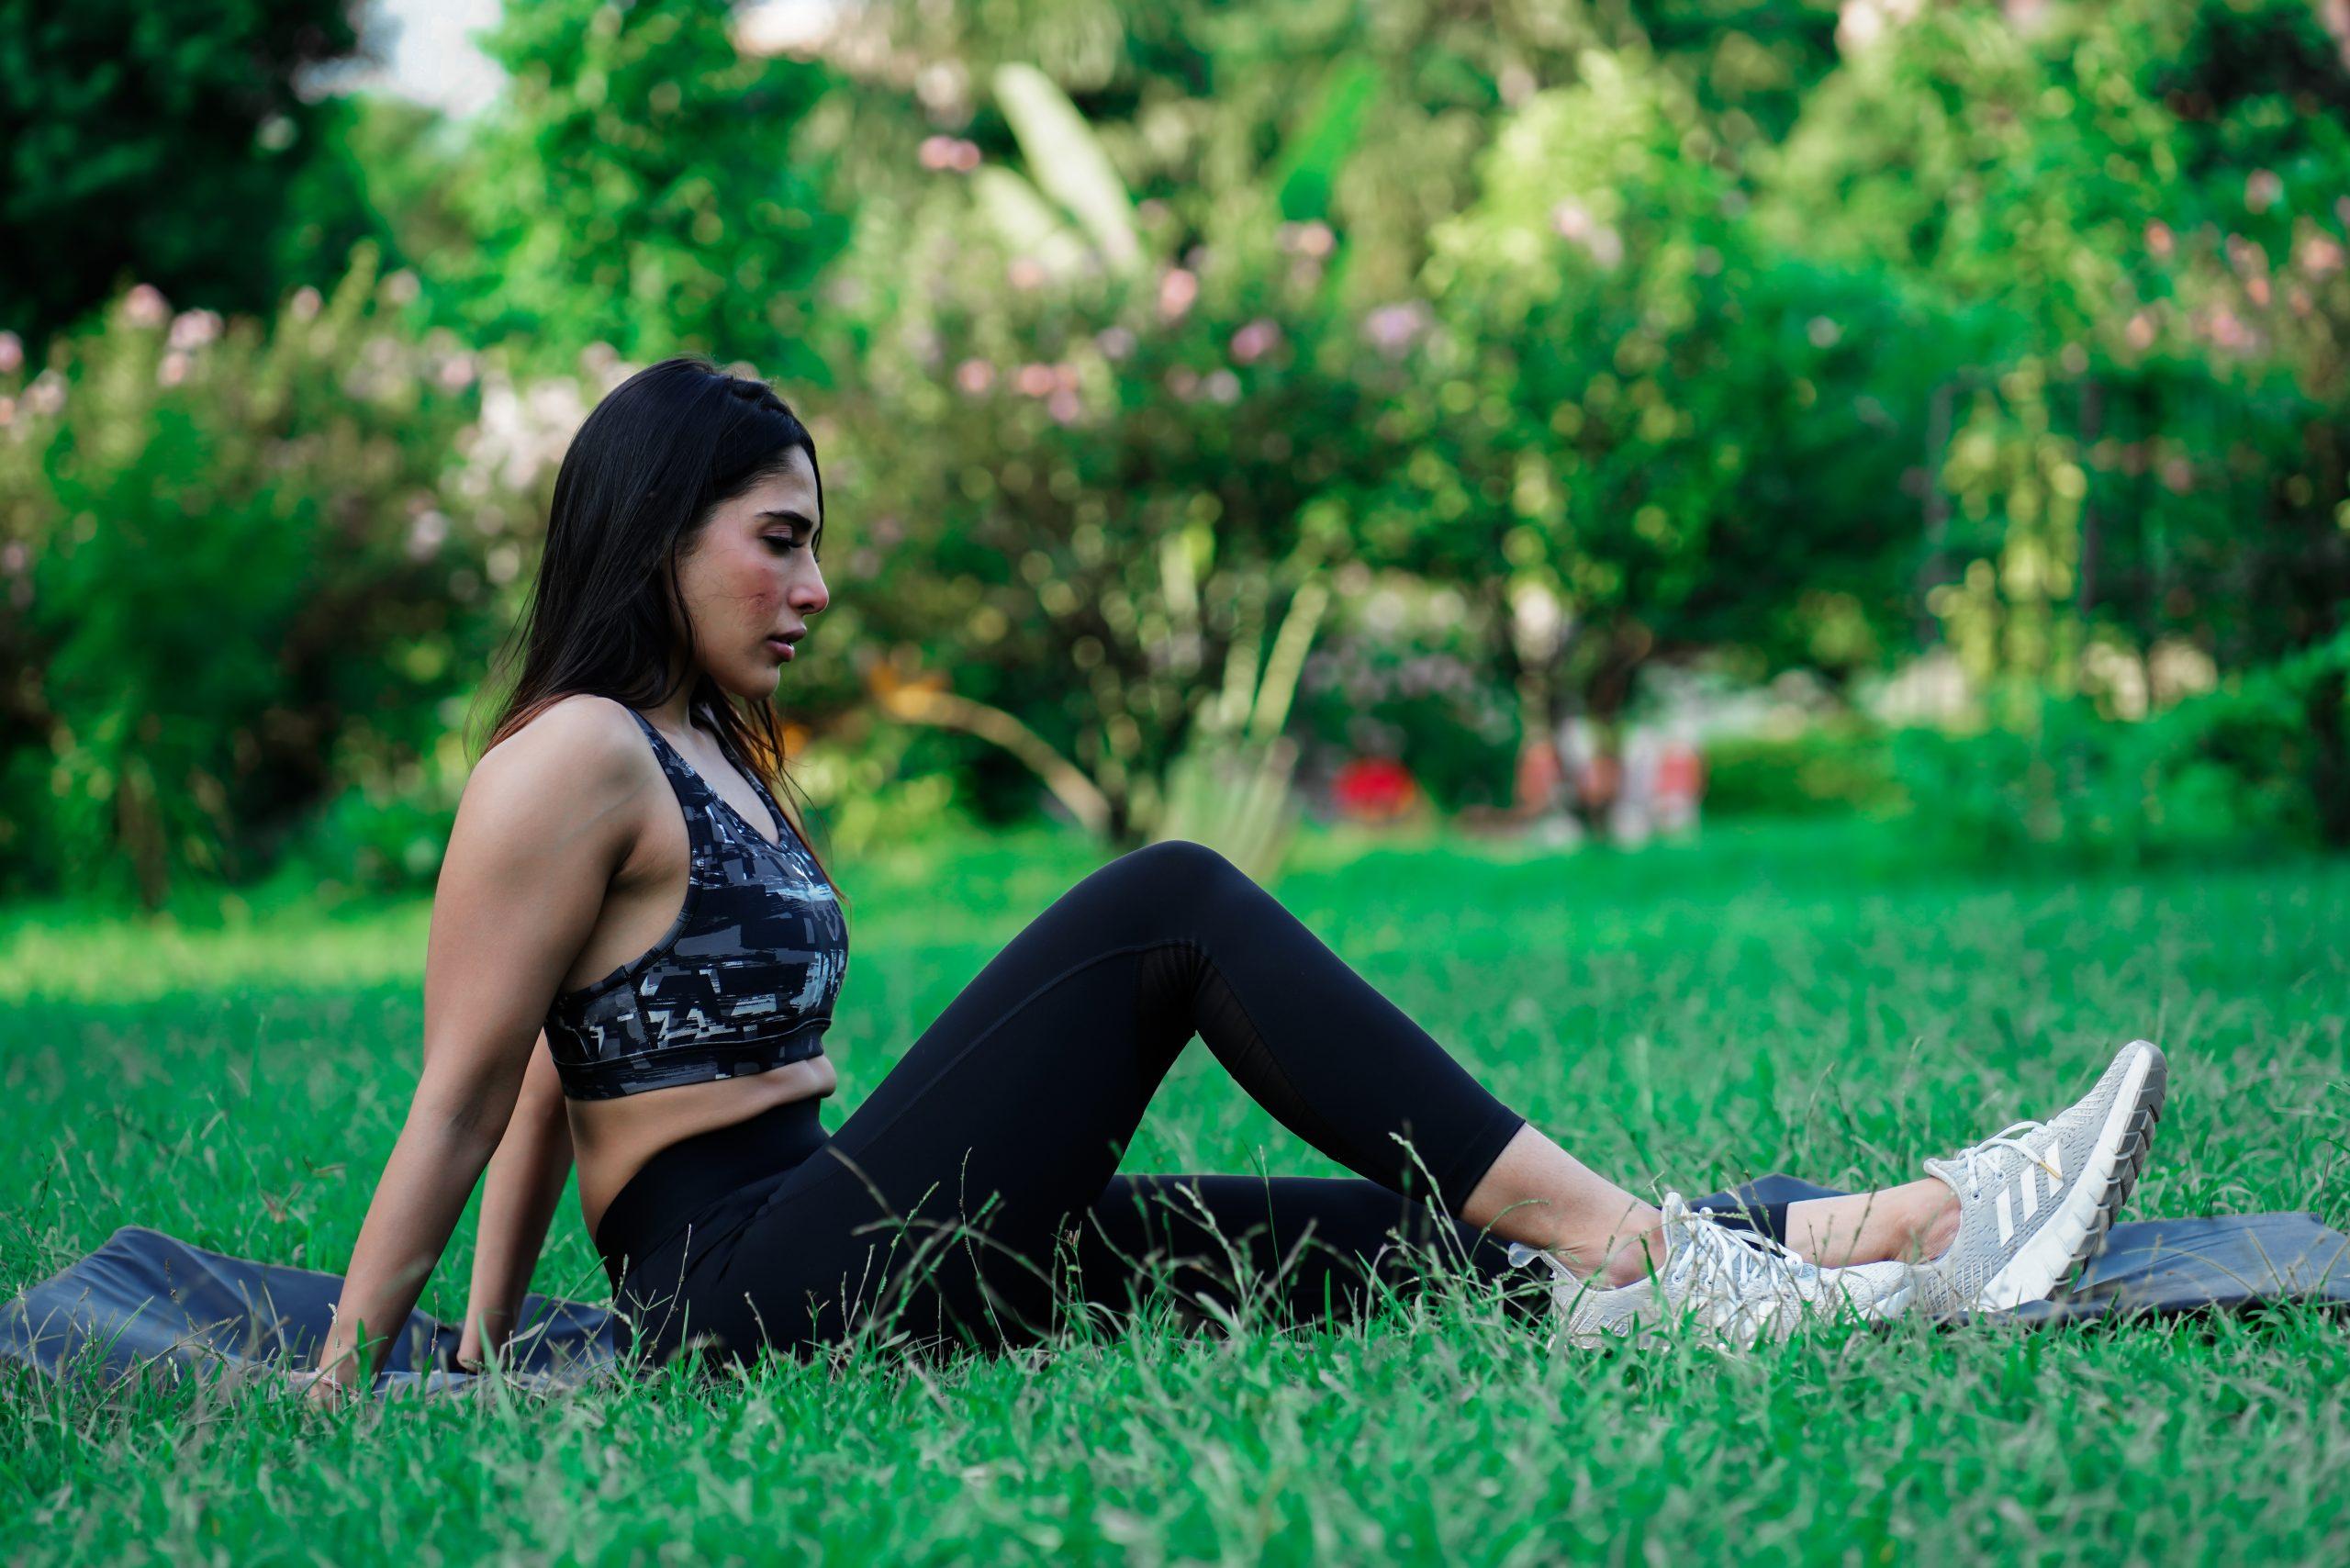 Female sitting in park